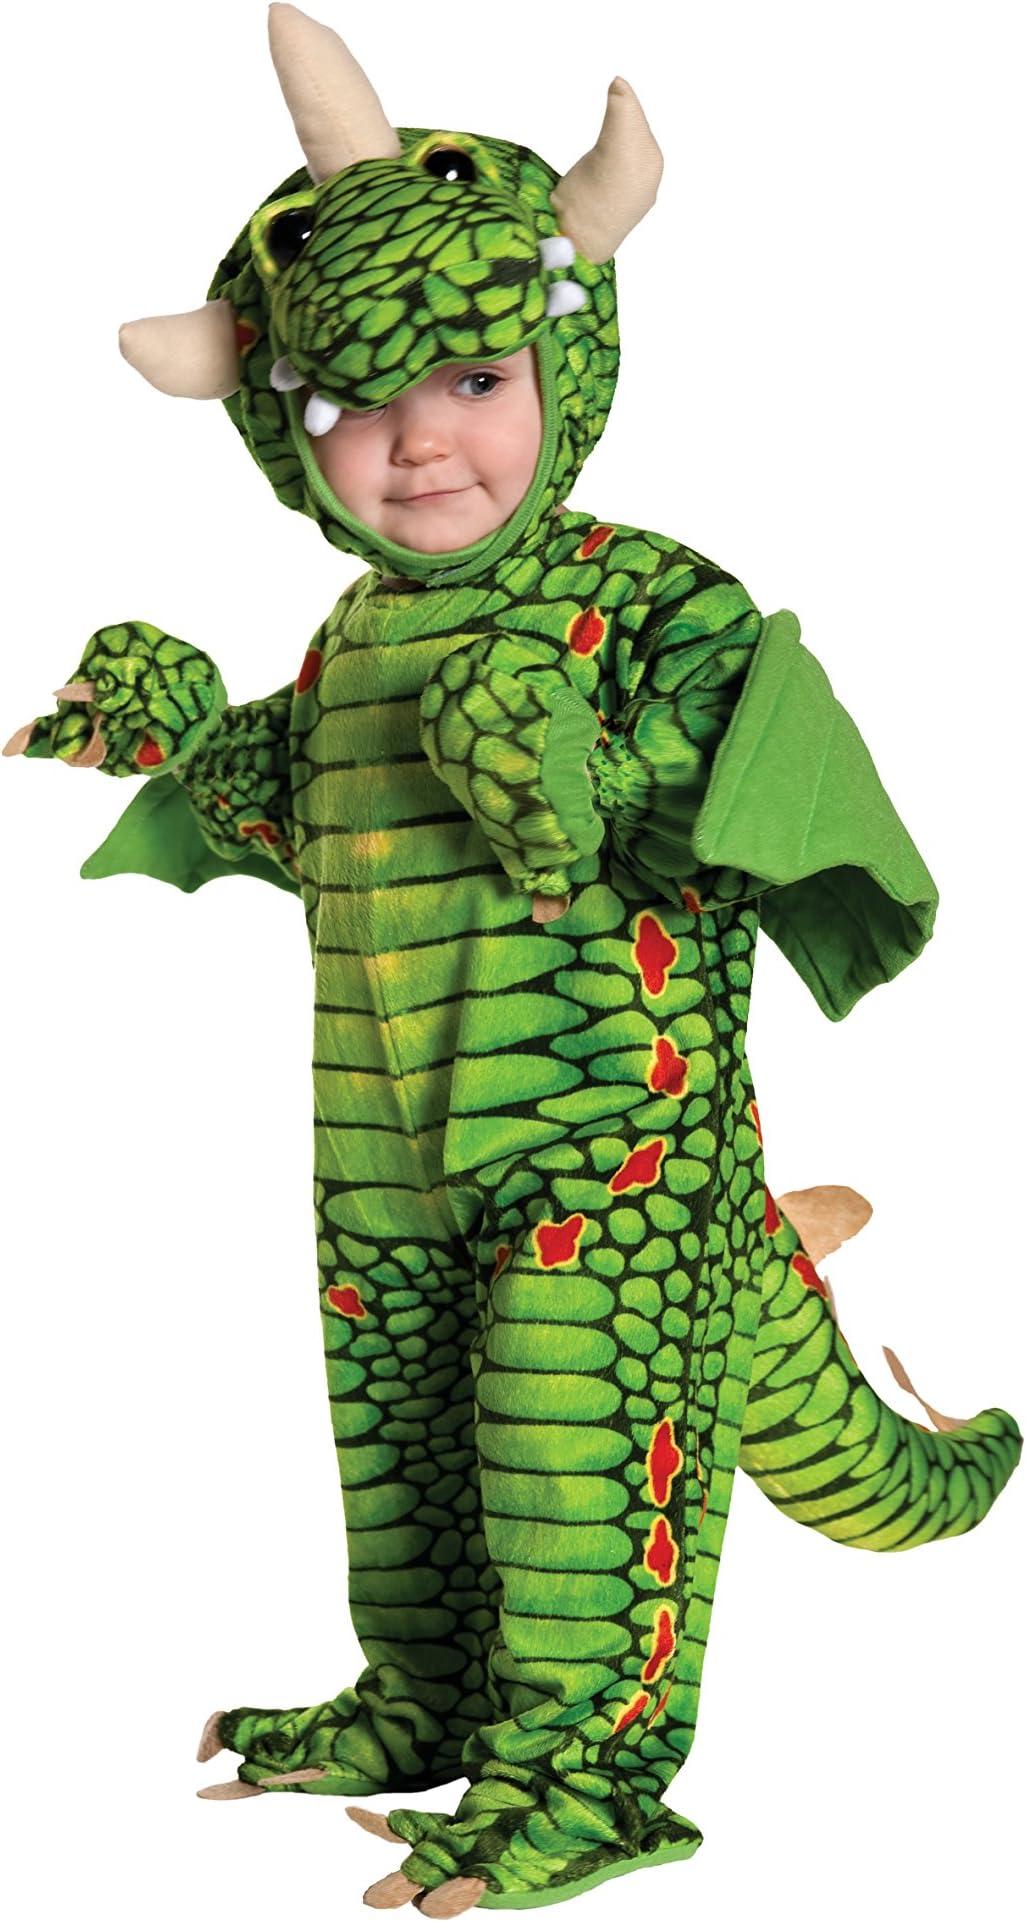 Kids Girly Dragon Print Deluxe Halloween Costume Fire Breathing Dragon Tutu Dress Little Girls Size 6 12 Months 2T 3T 4 5 6 7 8